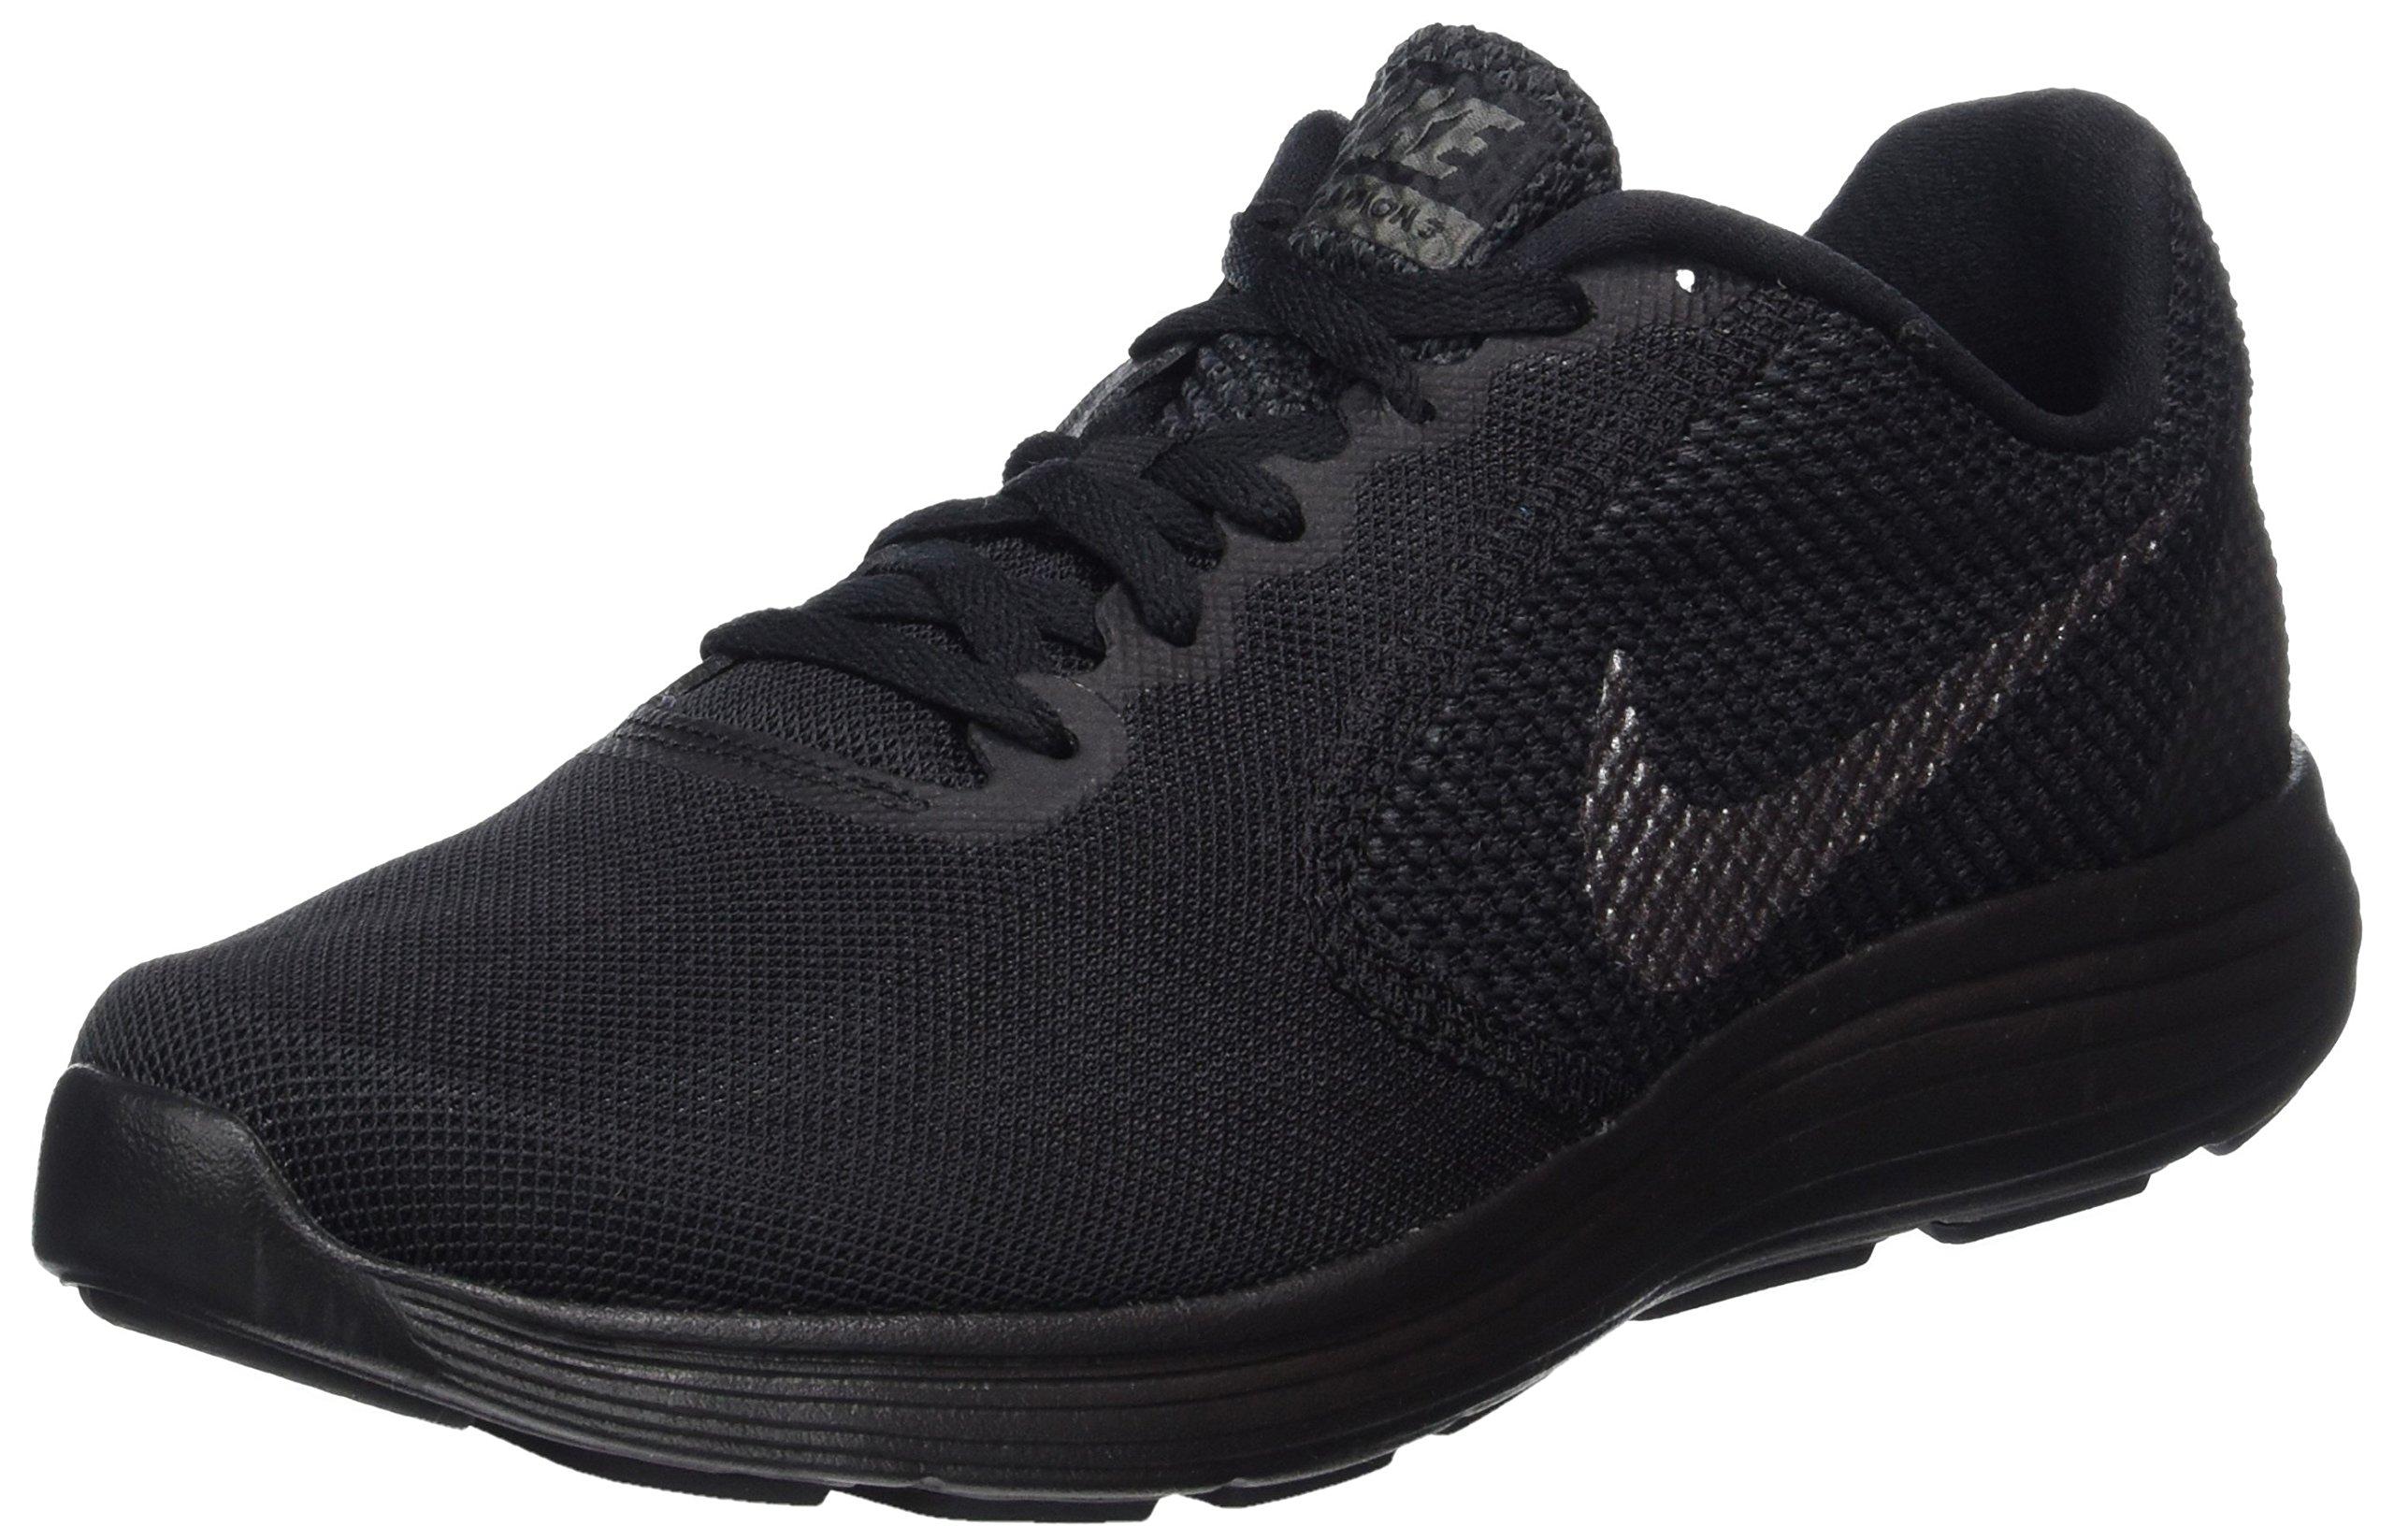 NIKE Men's Revolution 3 Running Shoe, Black/Metallic Dark Grey/Anthracite, 7 D(M) US